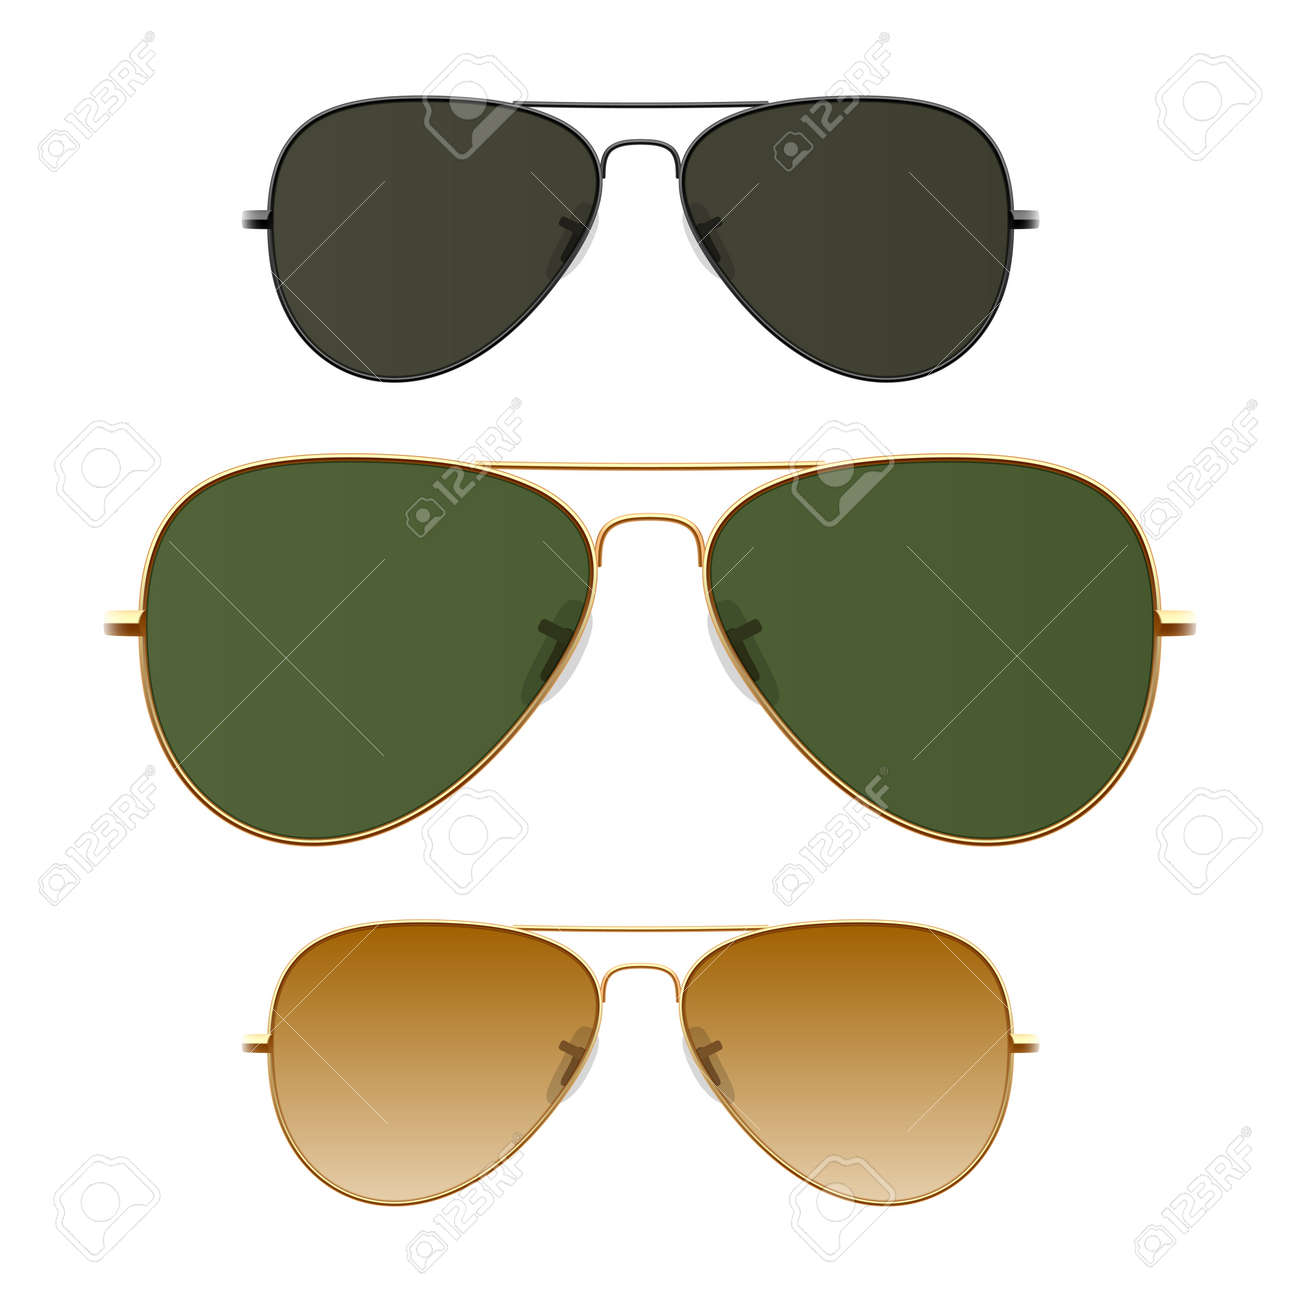 Sunglasses Stock Vector - 14046864